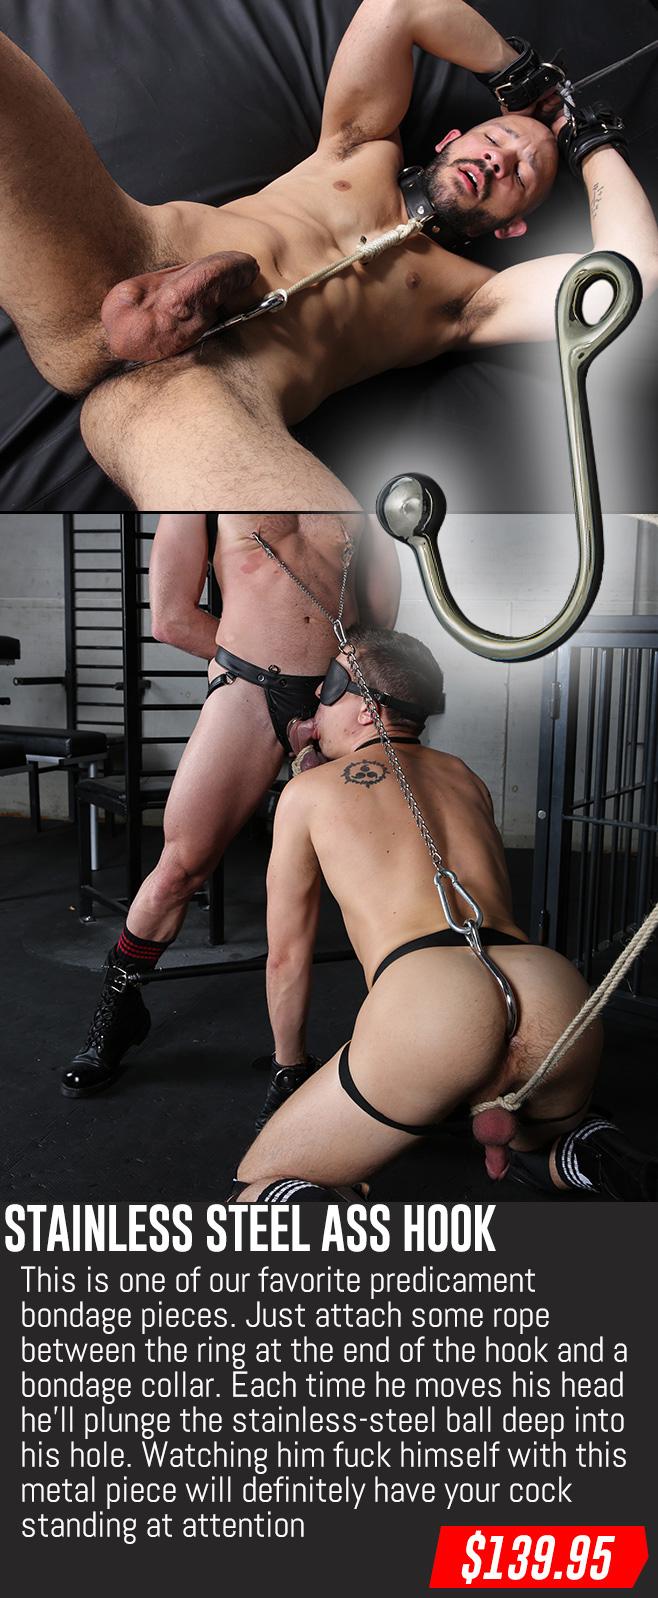 ass hook for gay bondage sex